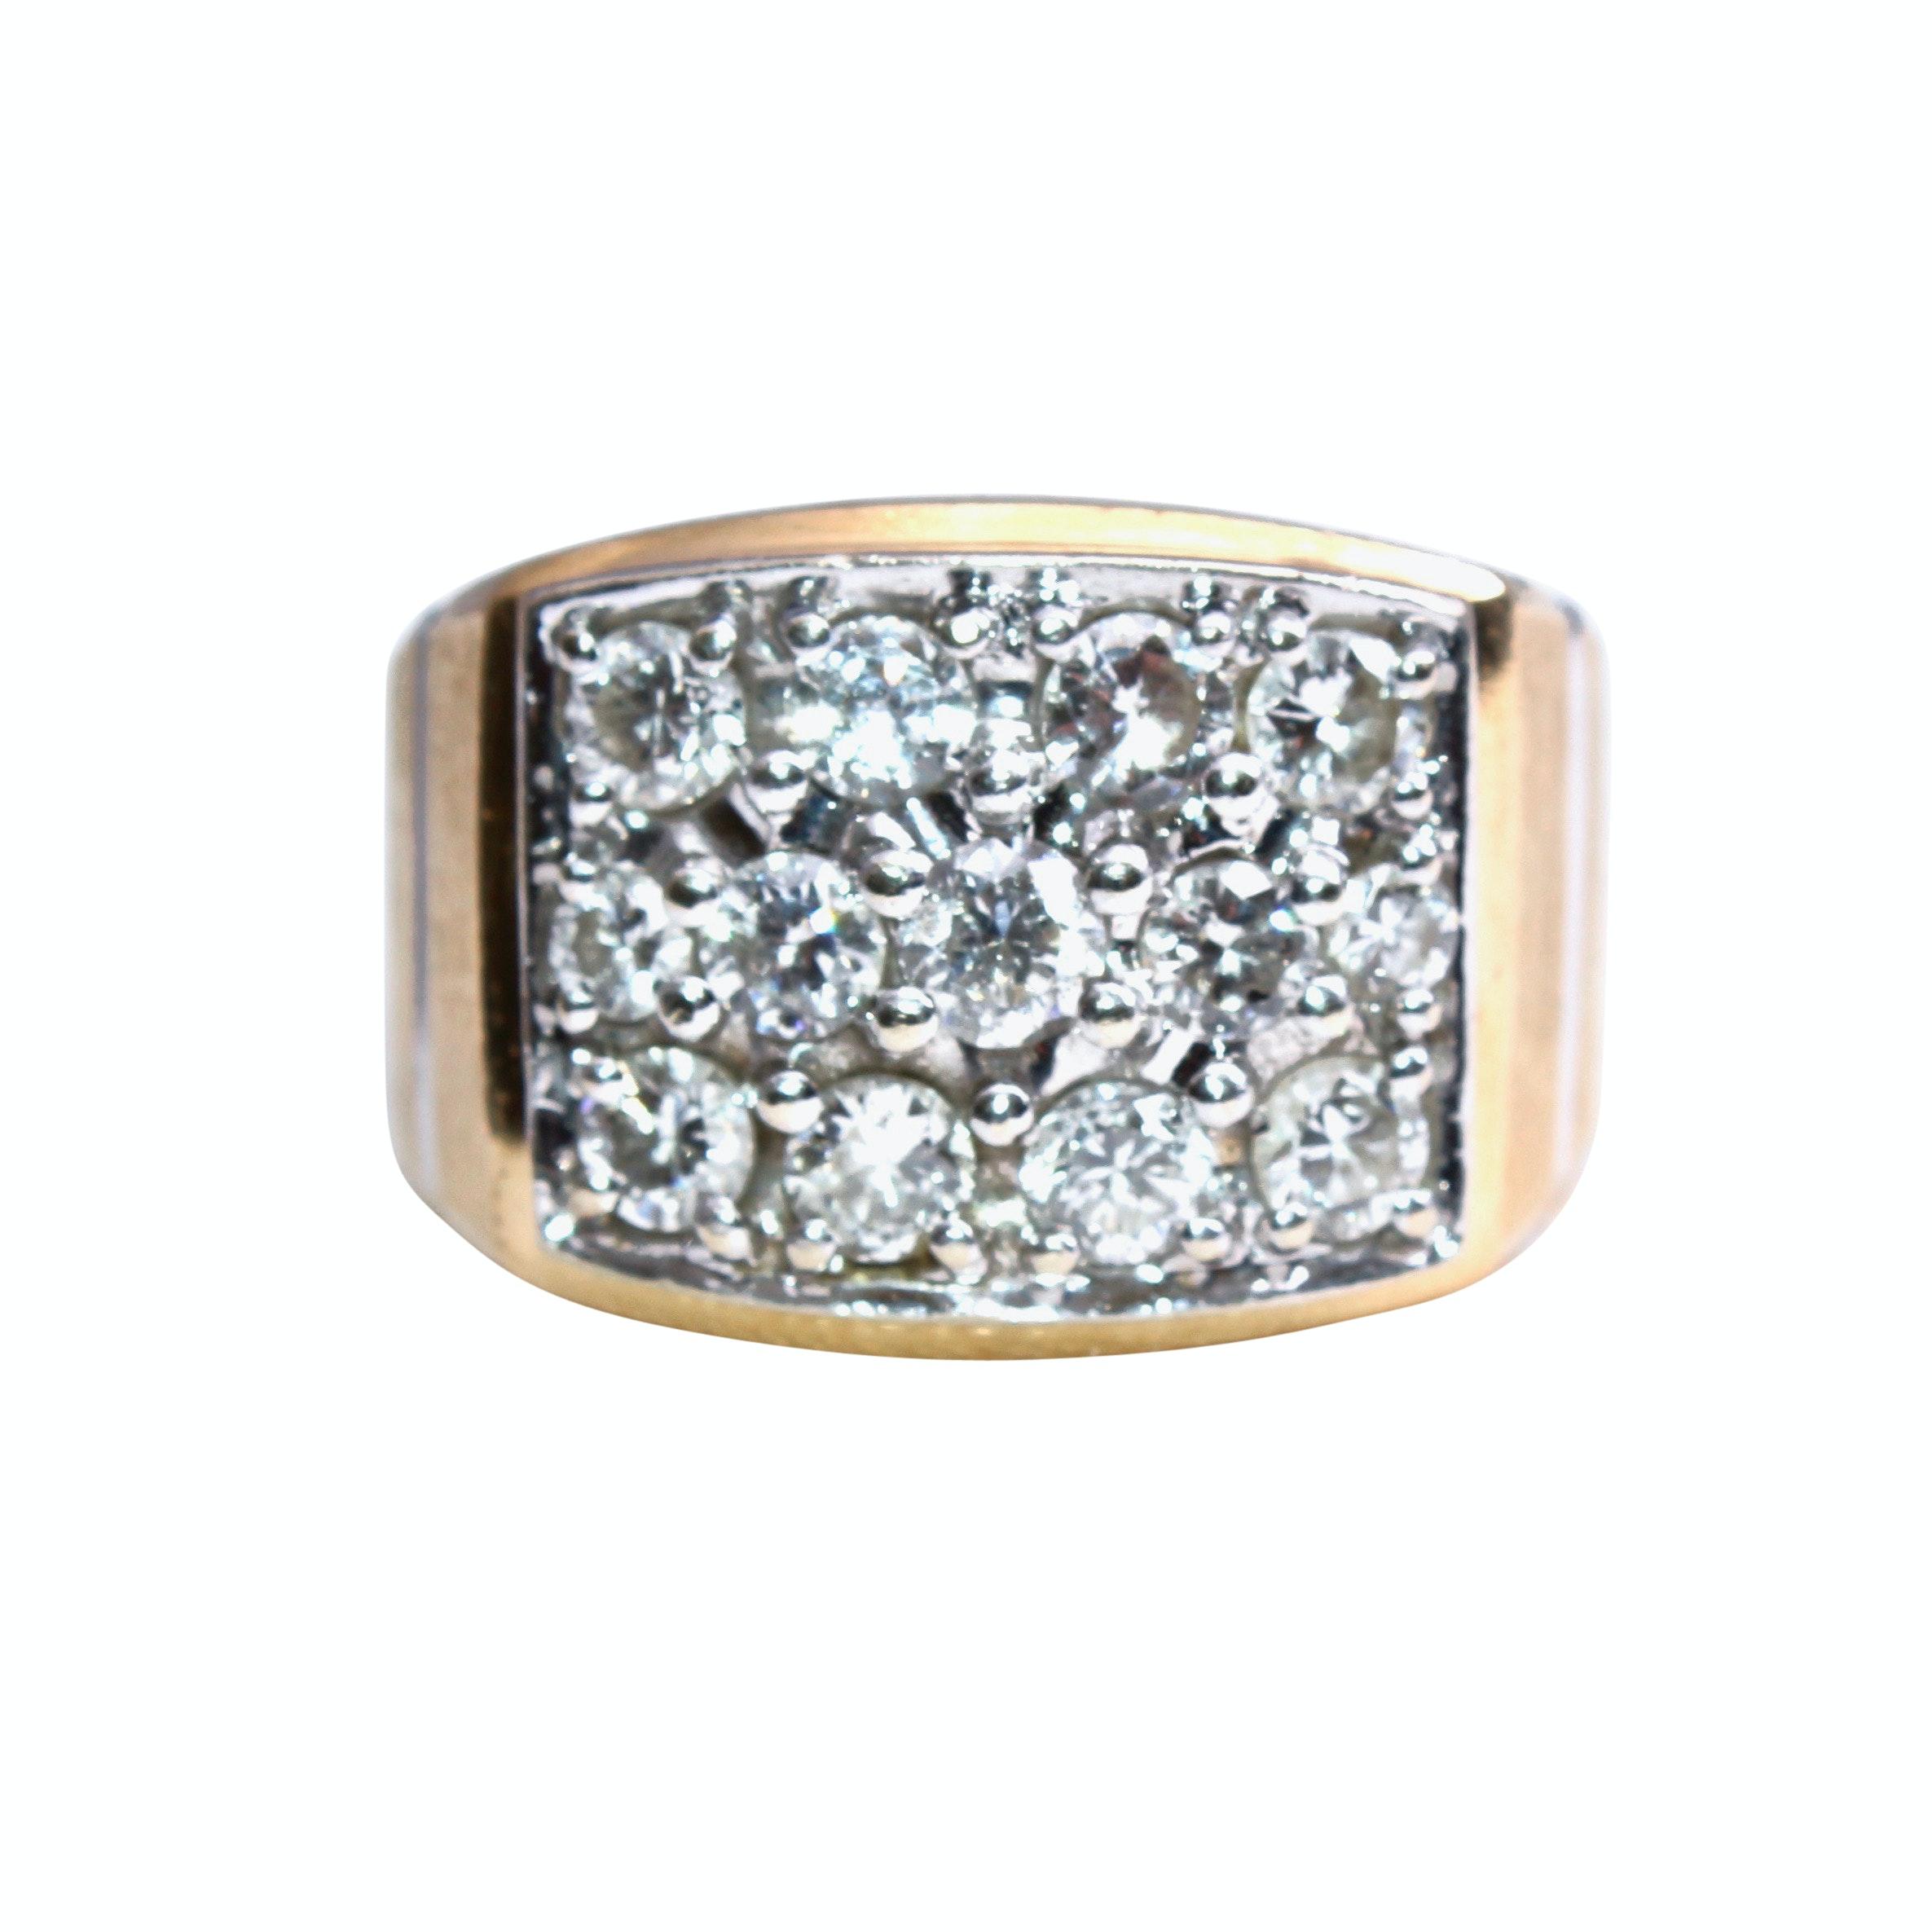 14K Yellow Gold 1.94 CTW Diamond Ring